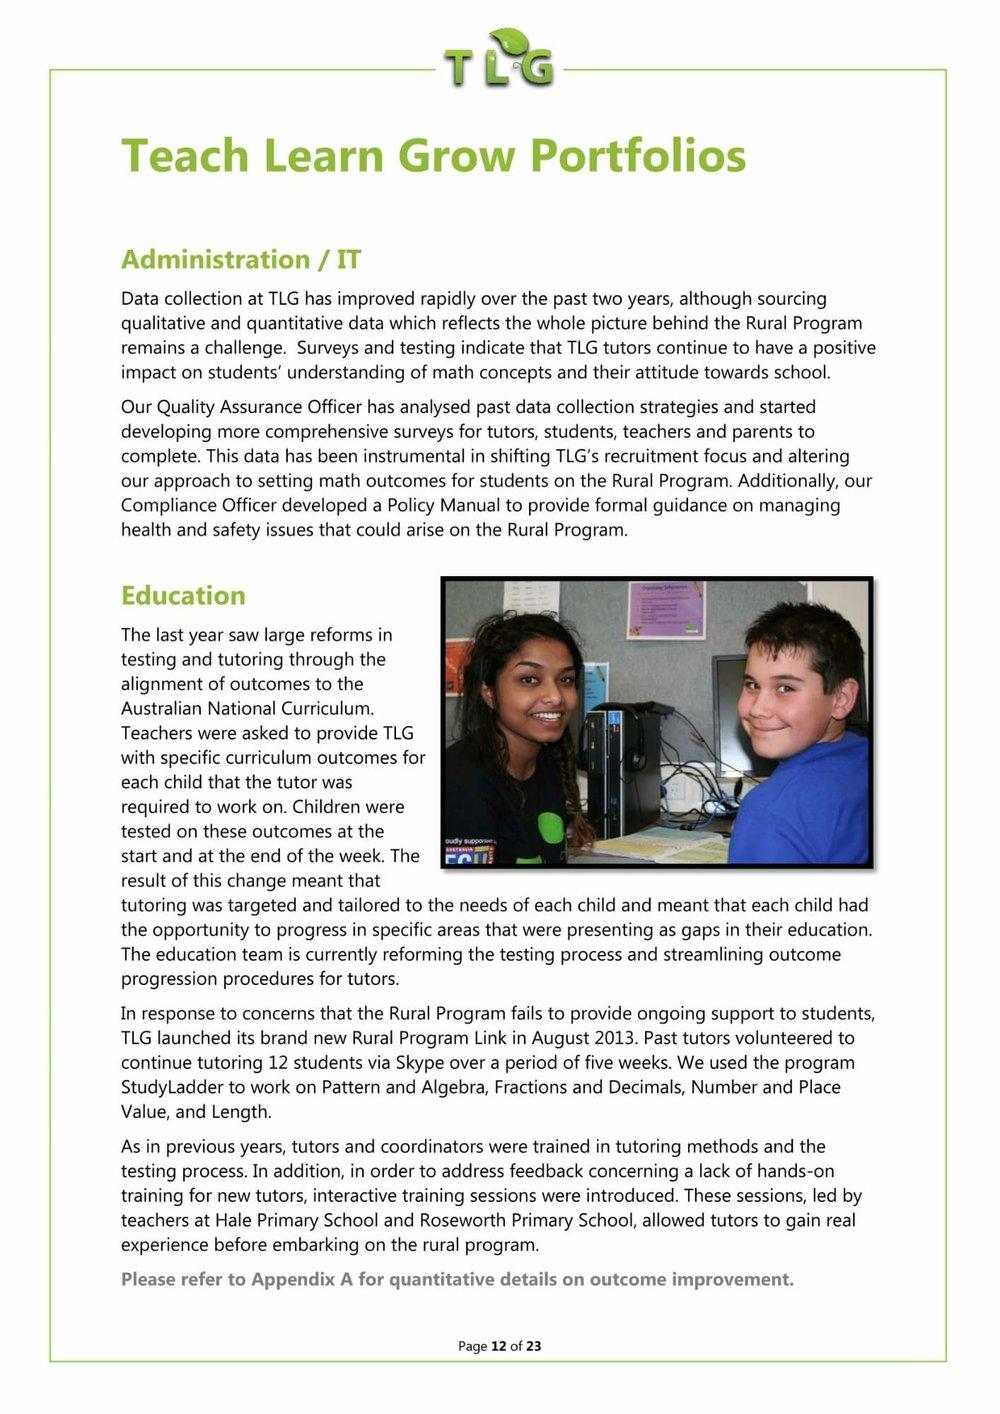 tlg-annual-report-FY13-12.jpg